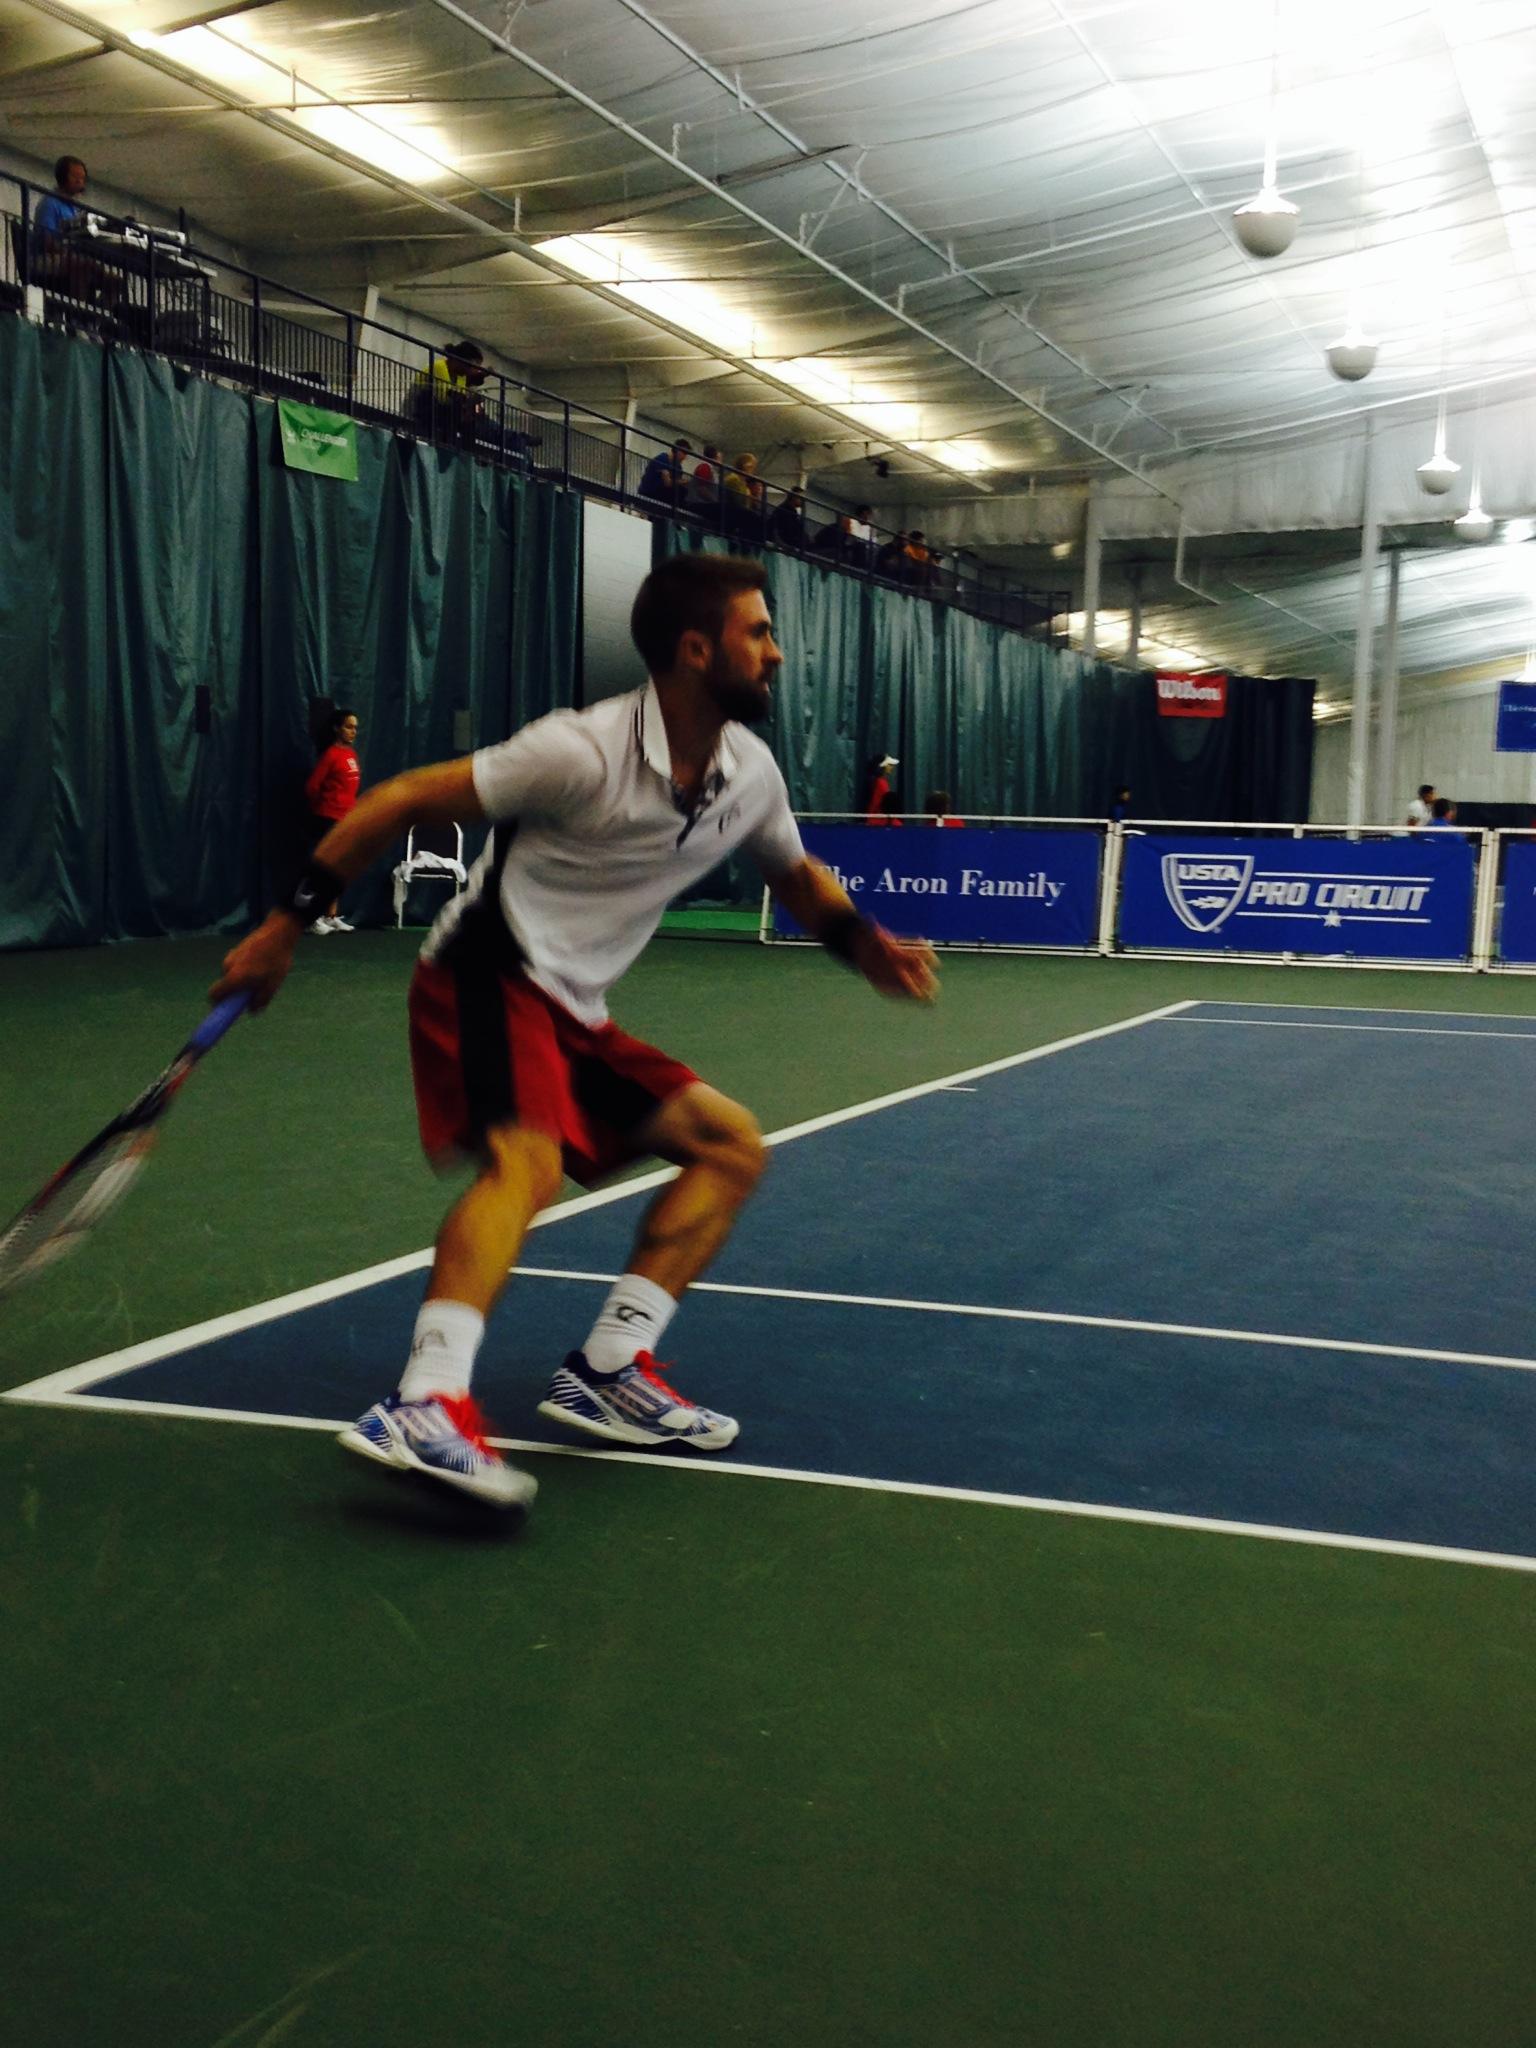 Tim Smyczek Tennis Prediction Picks - image 11